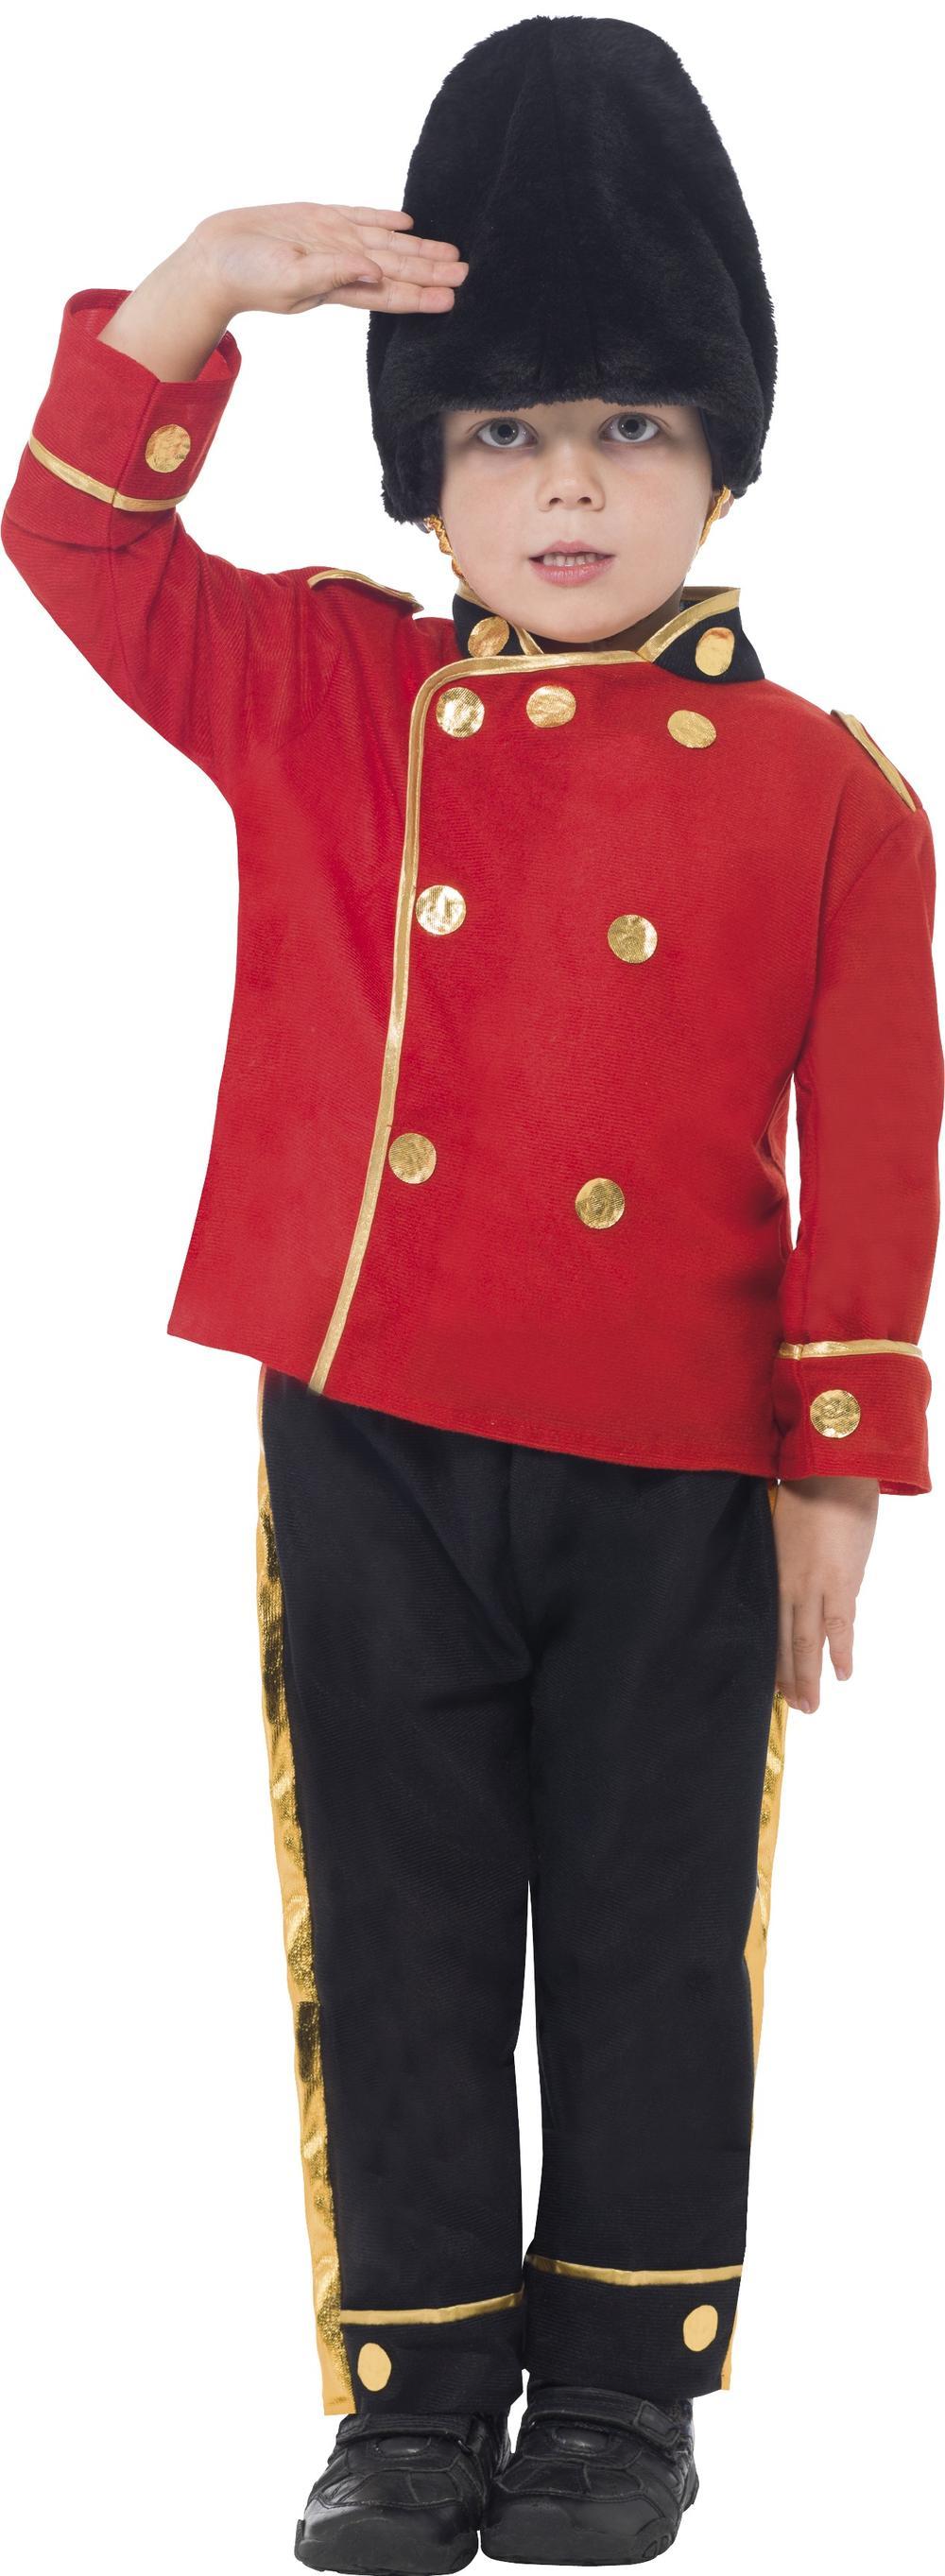 Royal Busby Guard Soldier Boys Fancy Dress British Uniform Kids Childs Costume